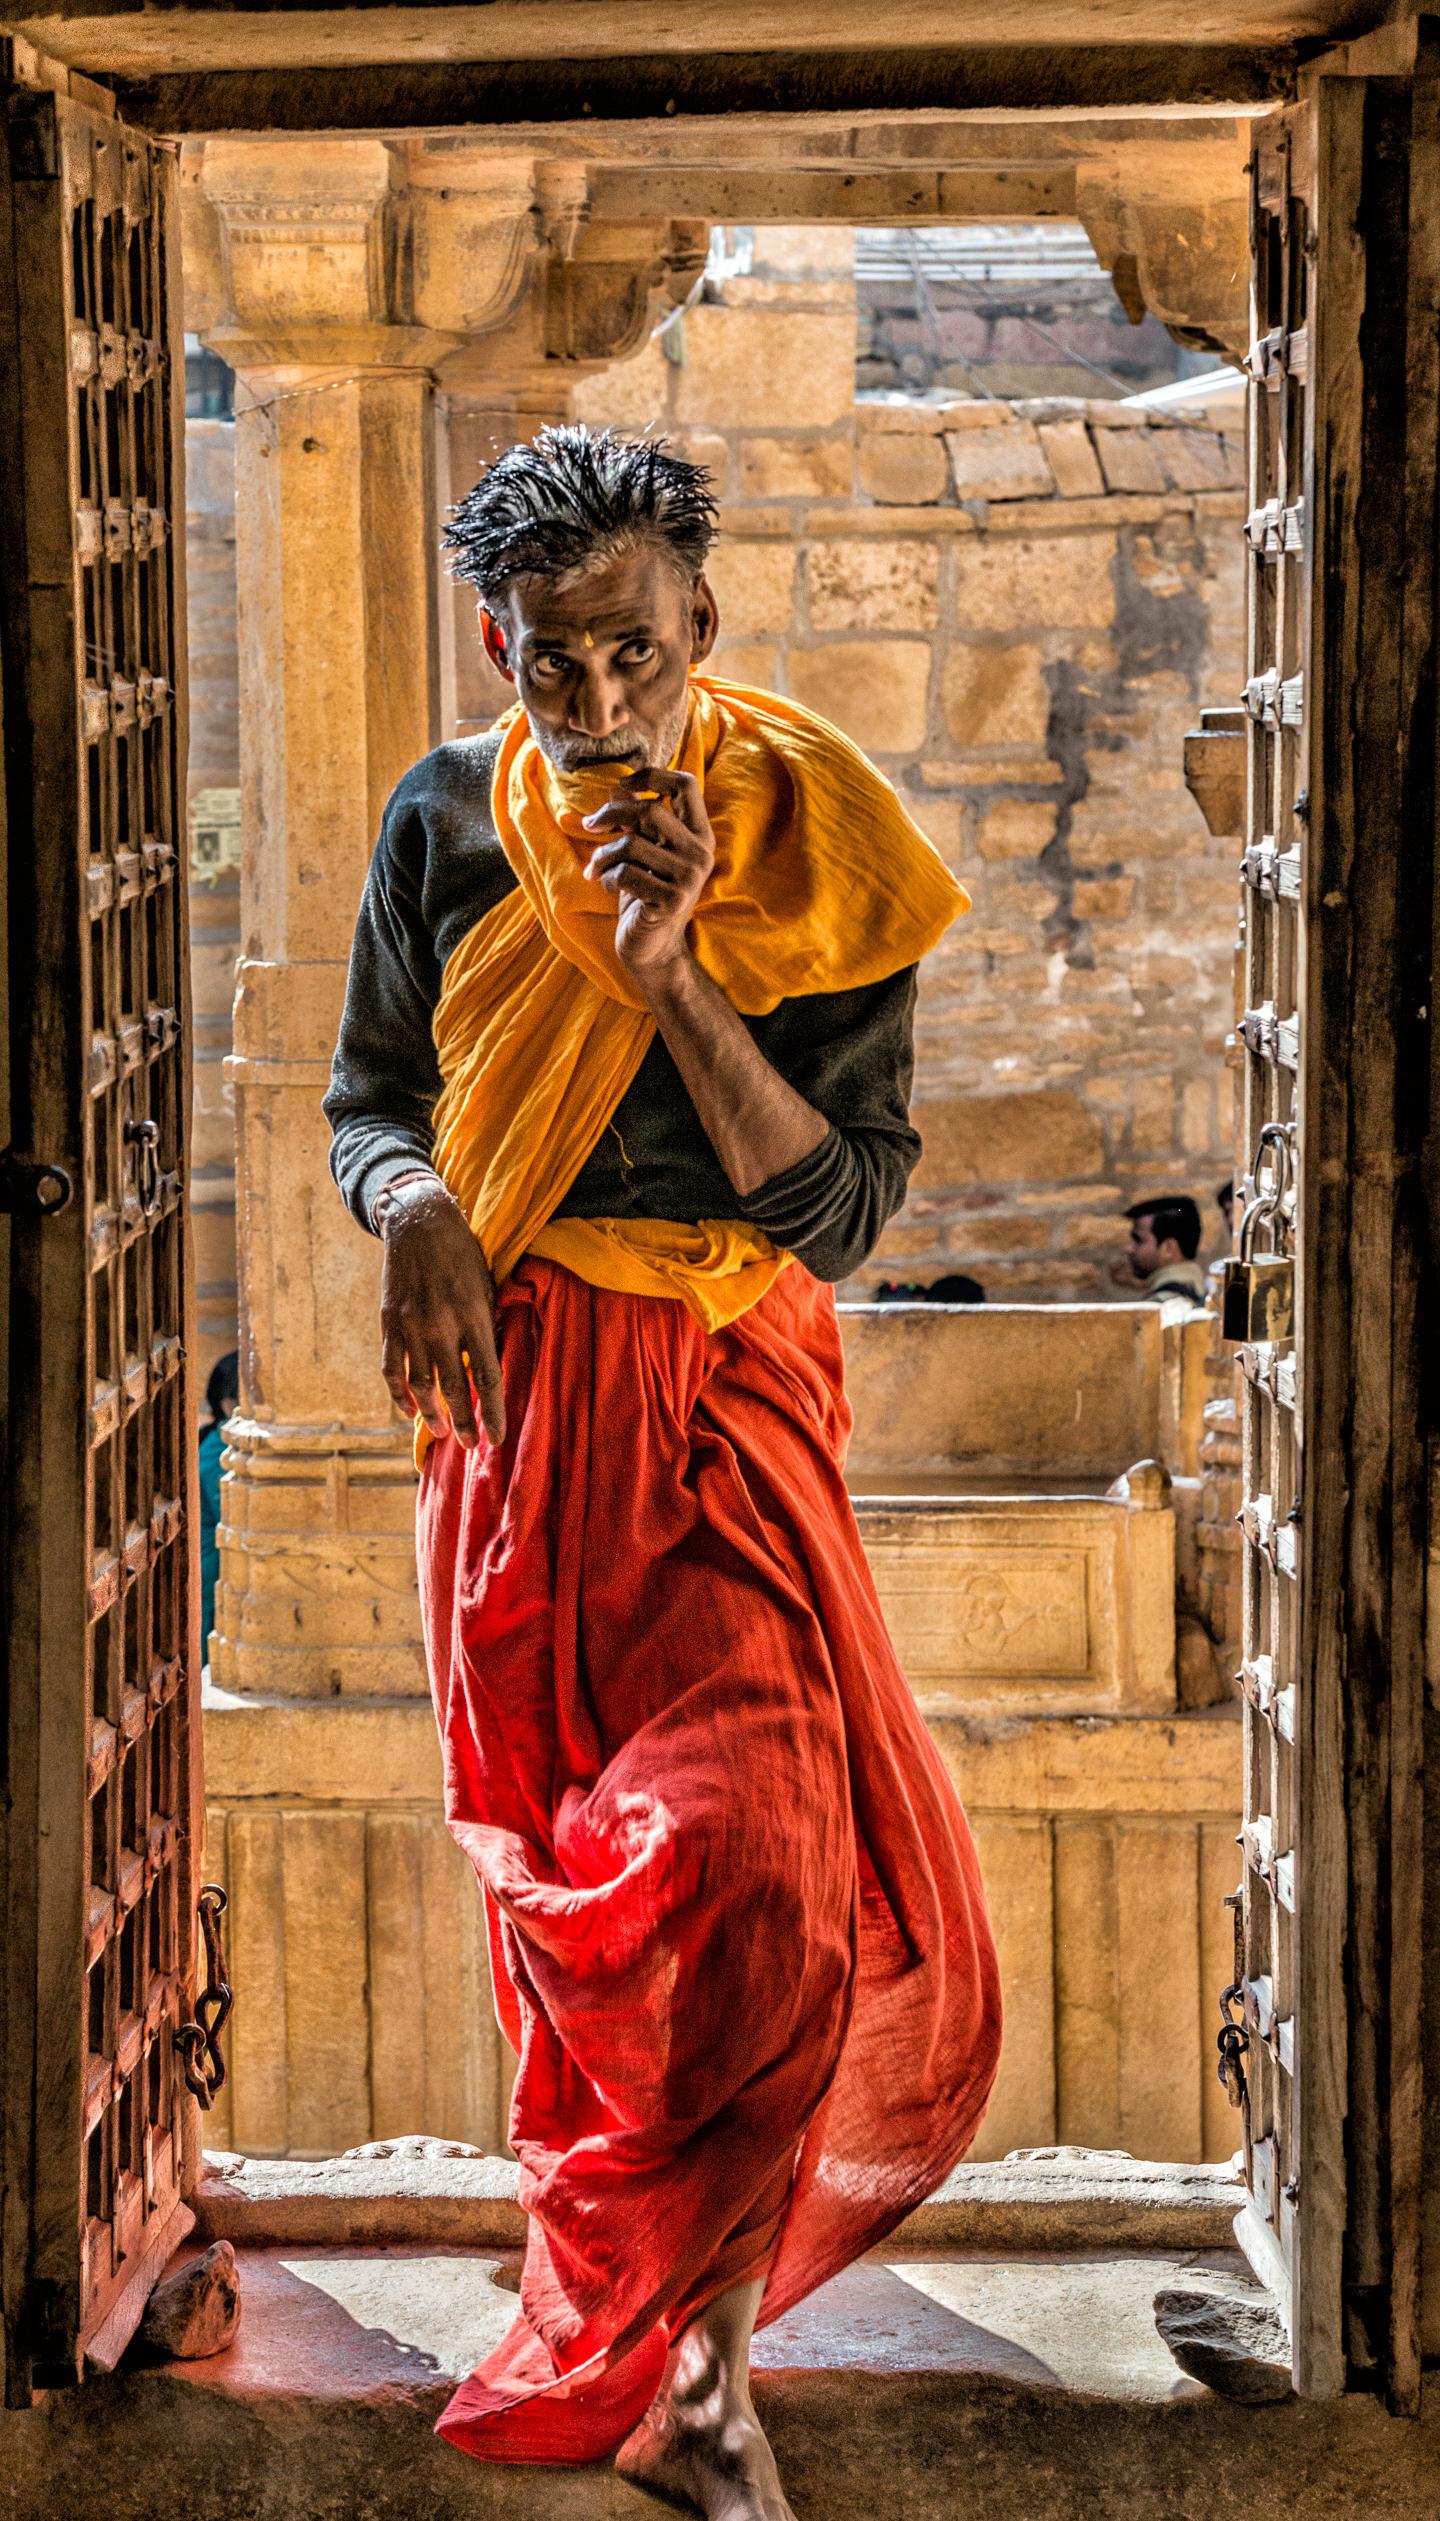 [2015_01_25]_India_2015_Jaisalmer_(NIKON_D800)_2164-Edit[1].jpg